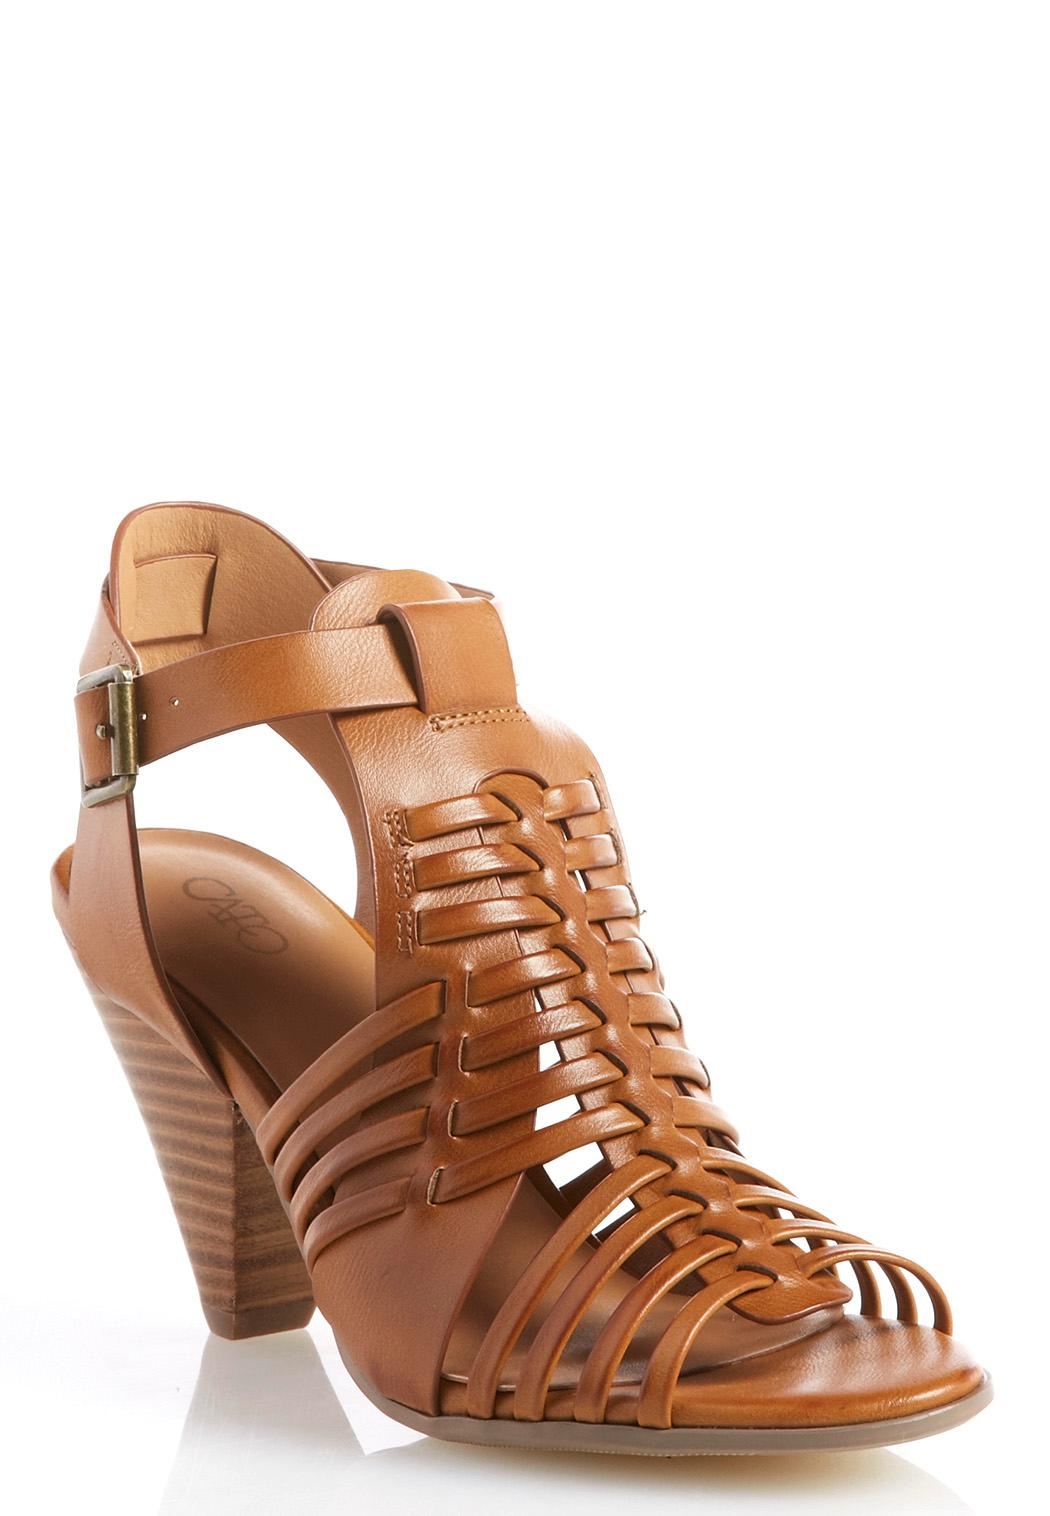 Huarache Cone Heel Shooties Ankle Amp Shooties Cato Fashions